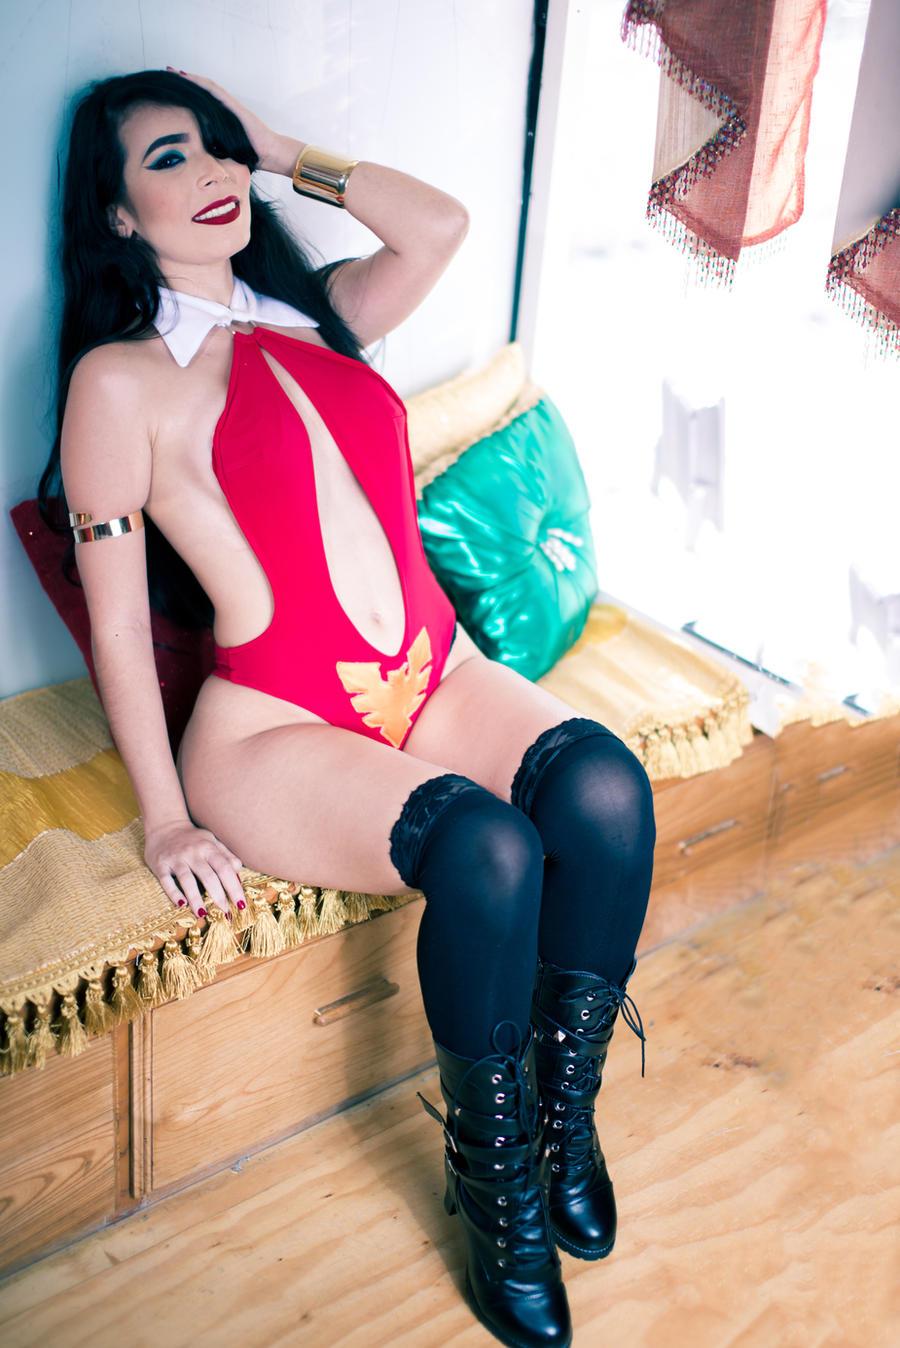 Vampirella Cosplay by caroangulito on DeviantArt